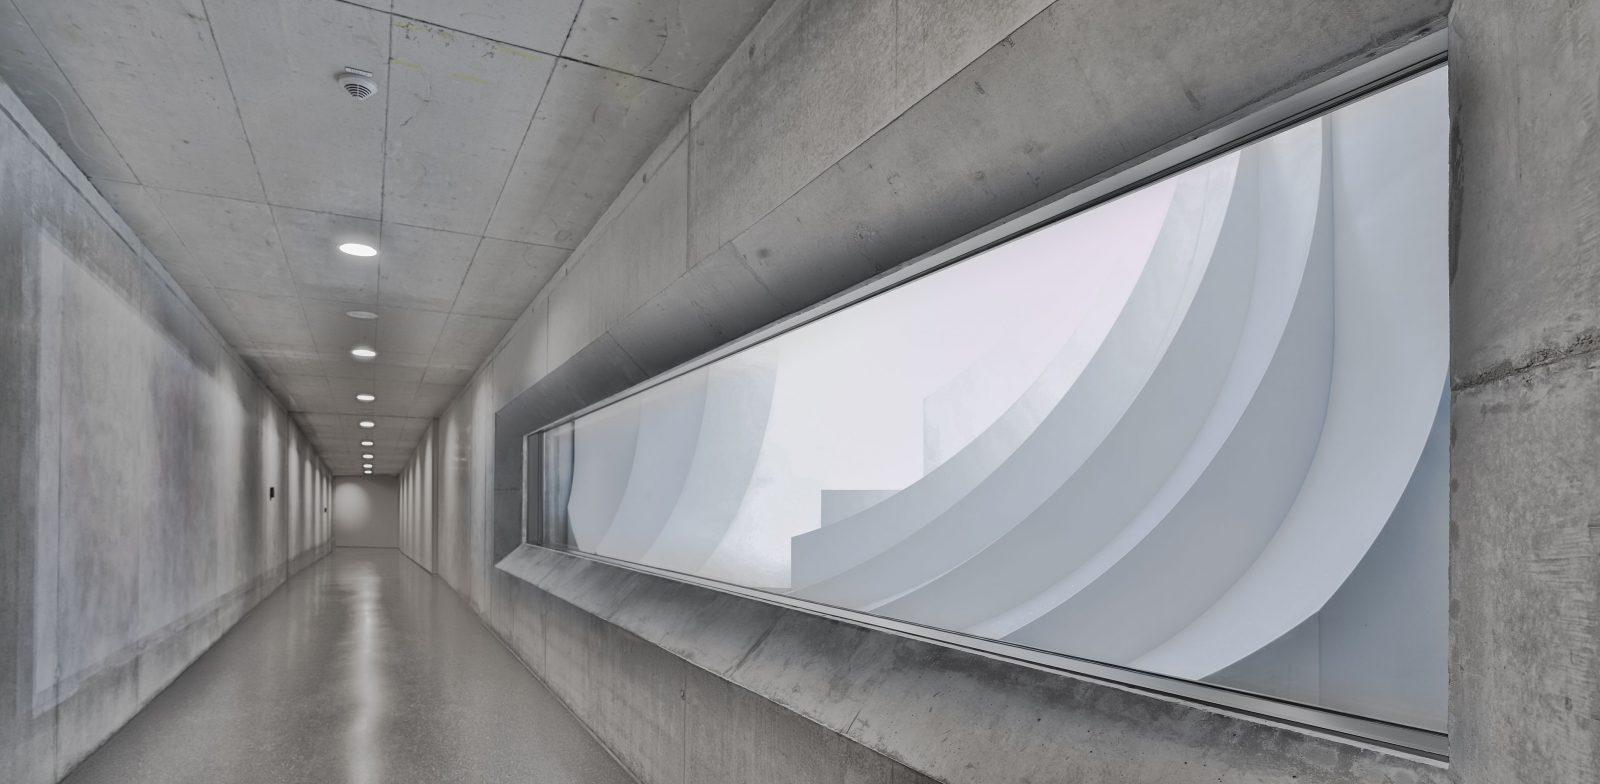 Justizvollzugsanstalt Regensburg, Besuchertunnel